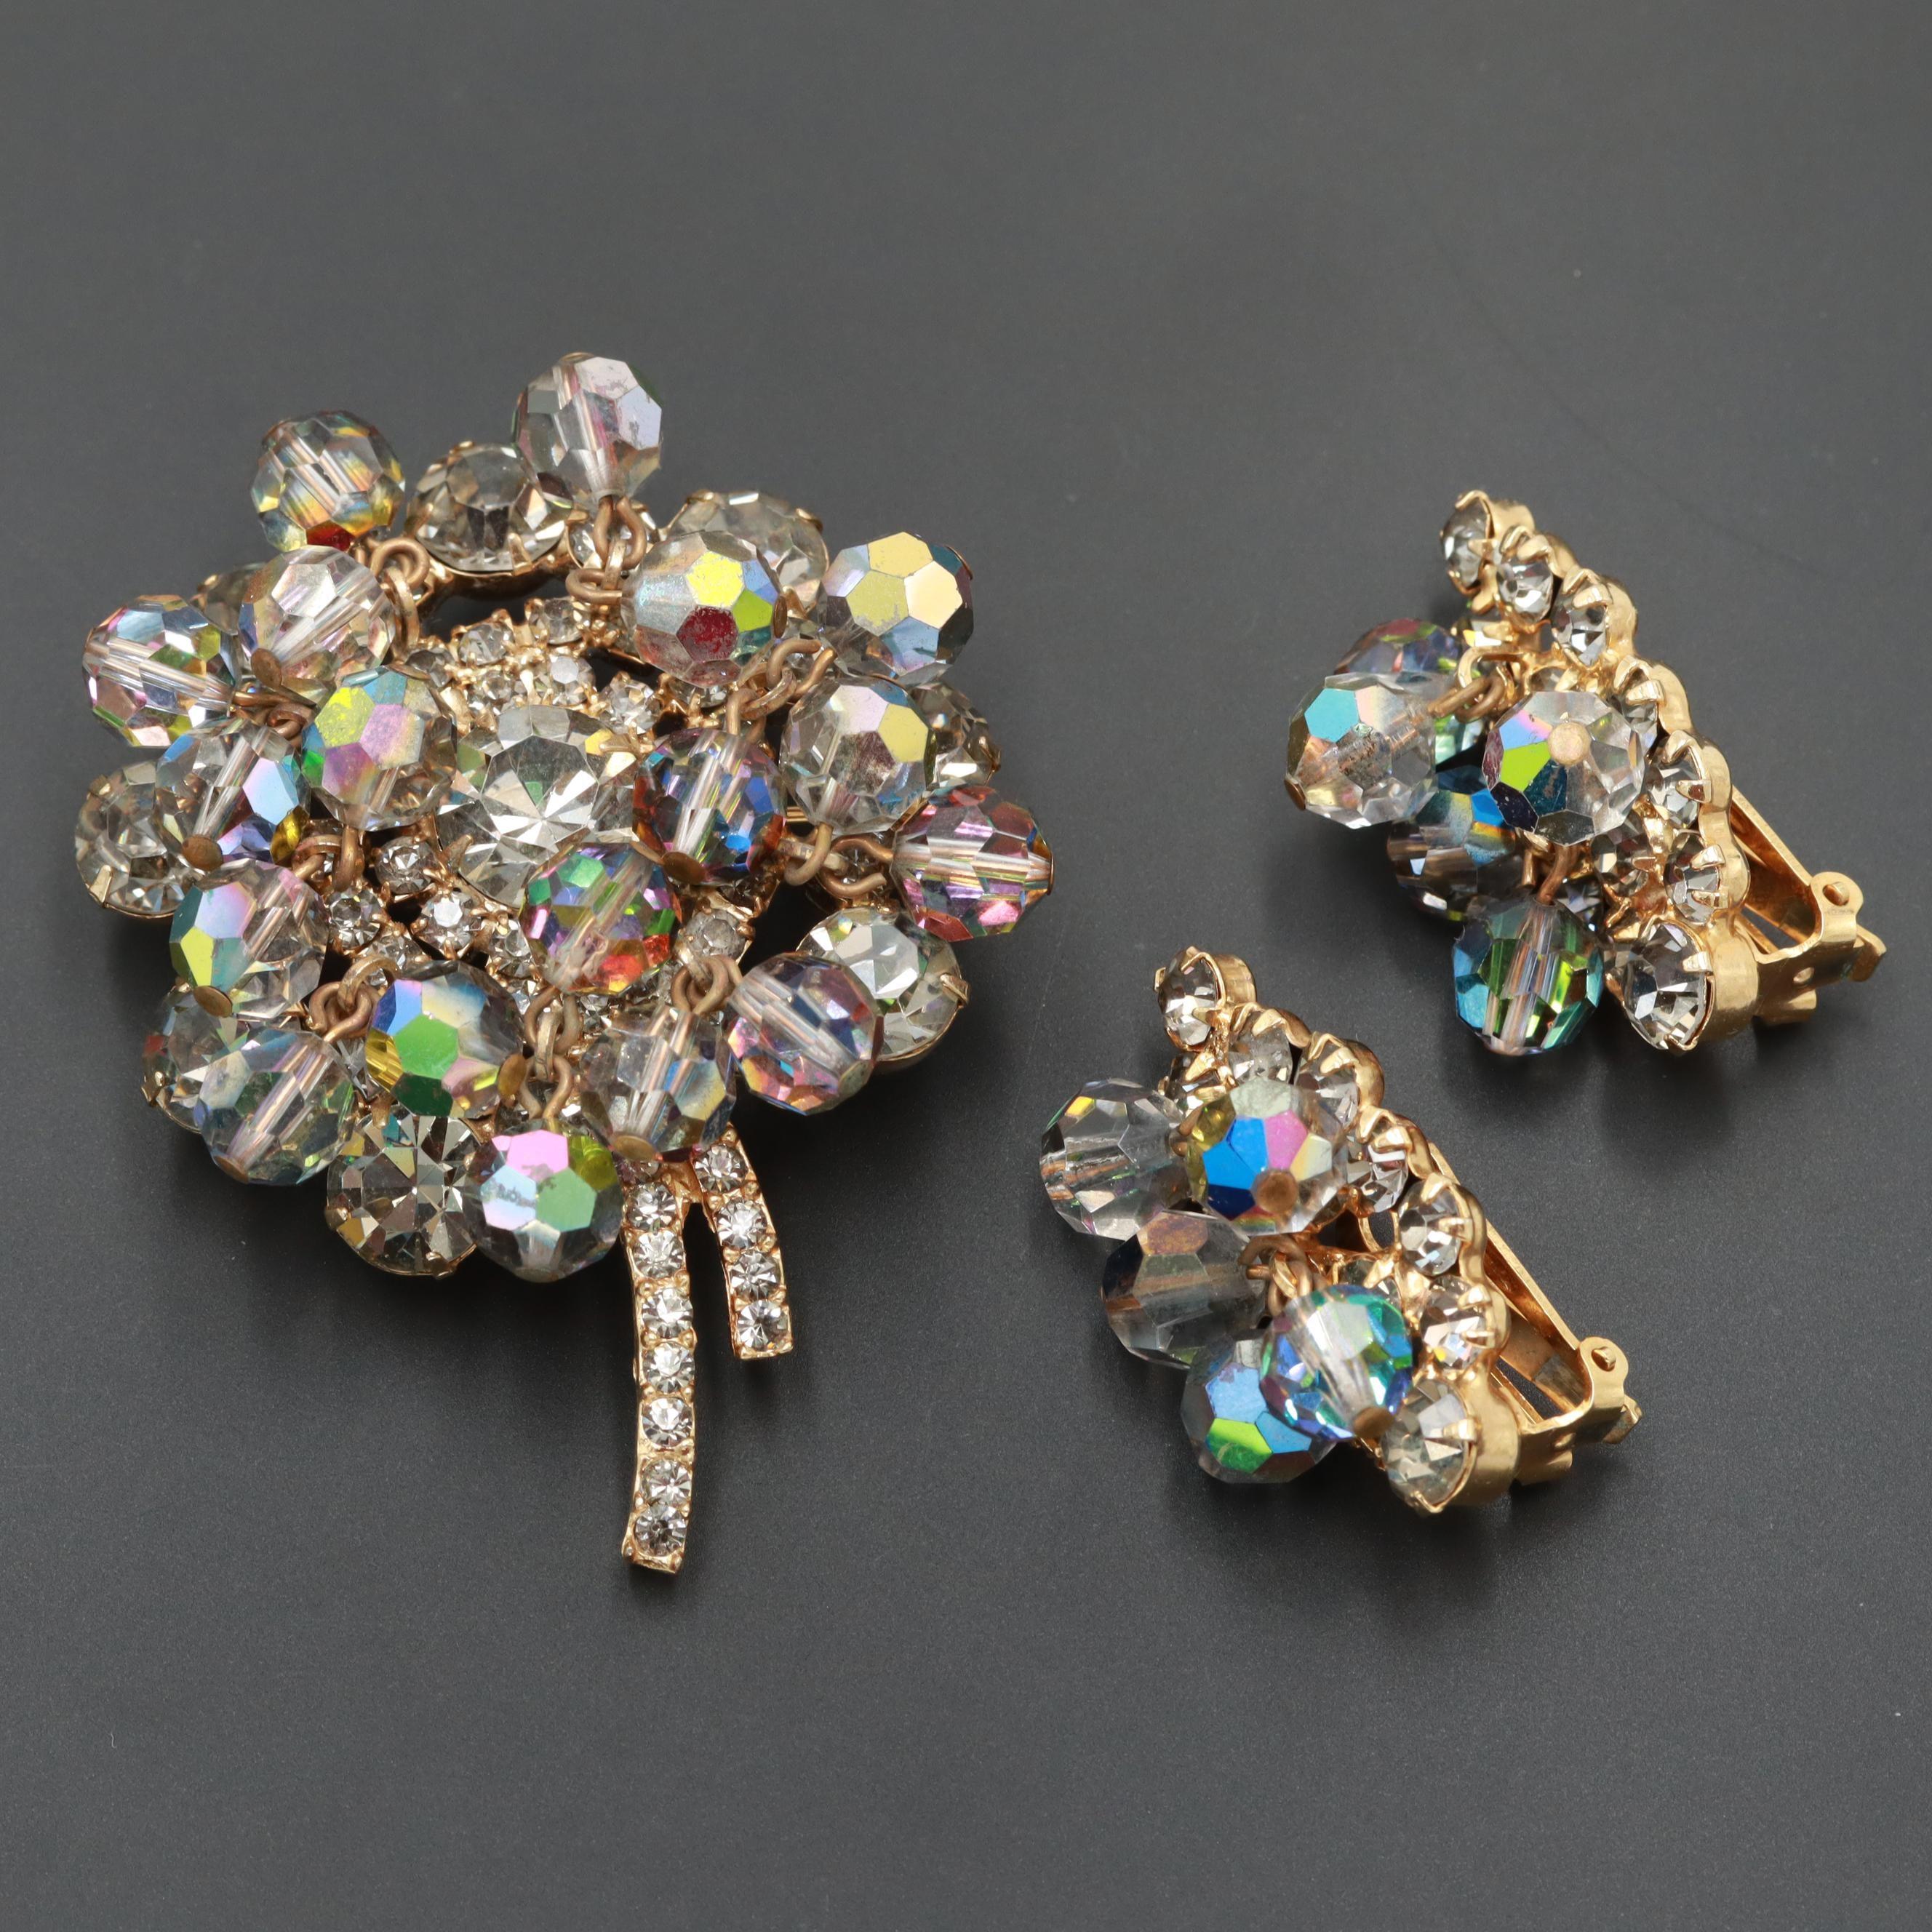 Vintage Juliana Gold Tone Glass and Foilback Glass Brooch and Earrings Set